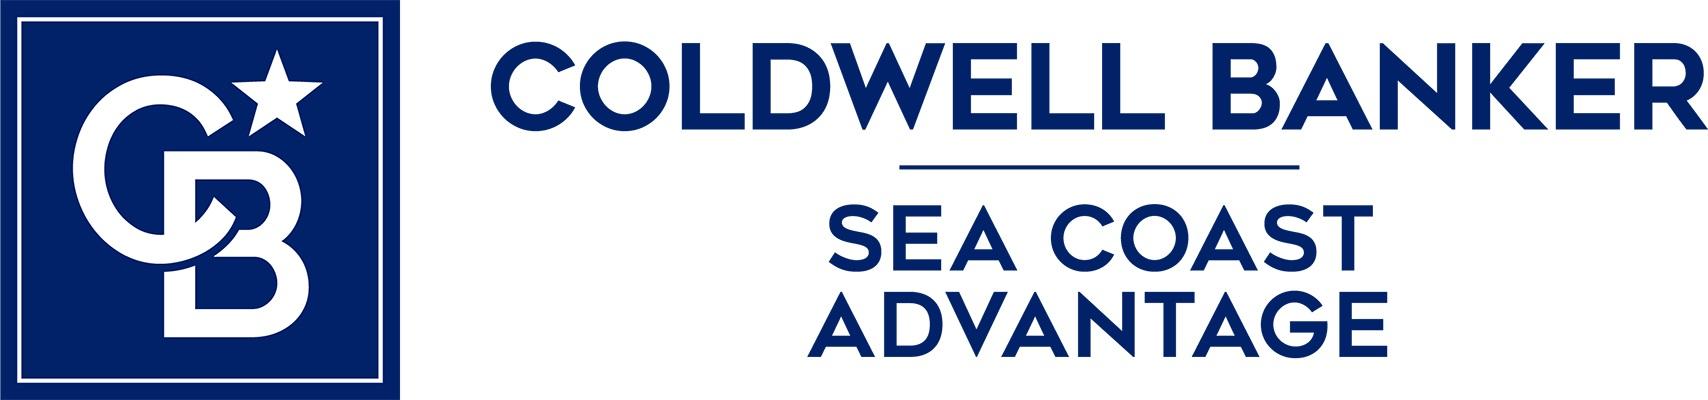 Christy Carr - Coldwell Banker Sea Coast Advantage Realty Logo